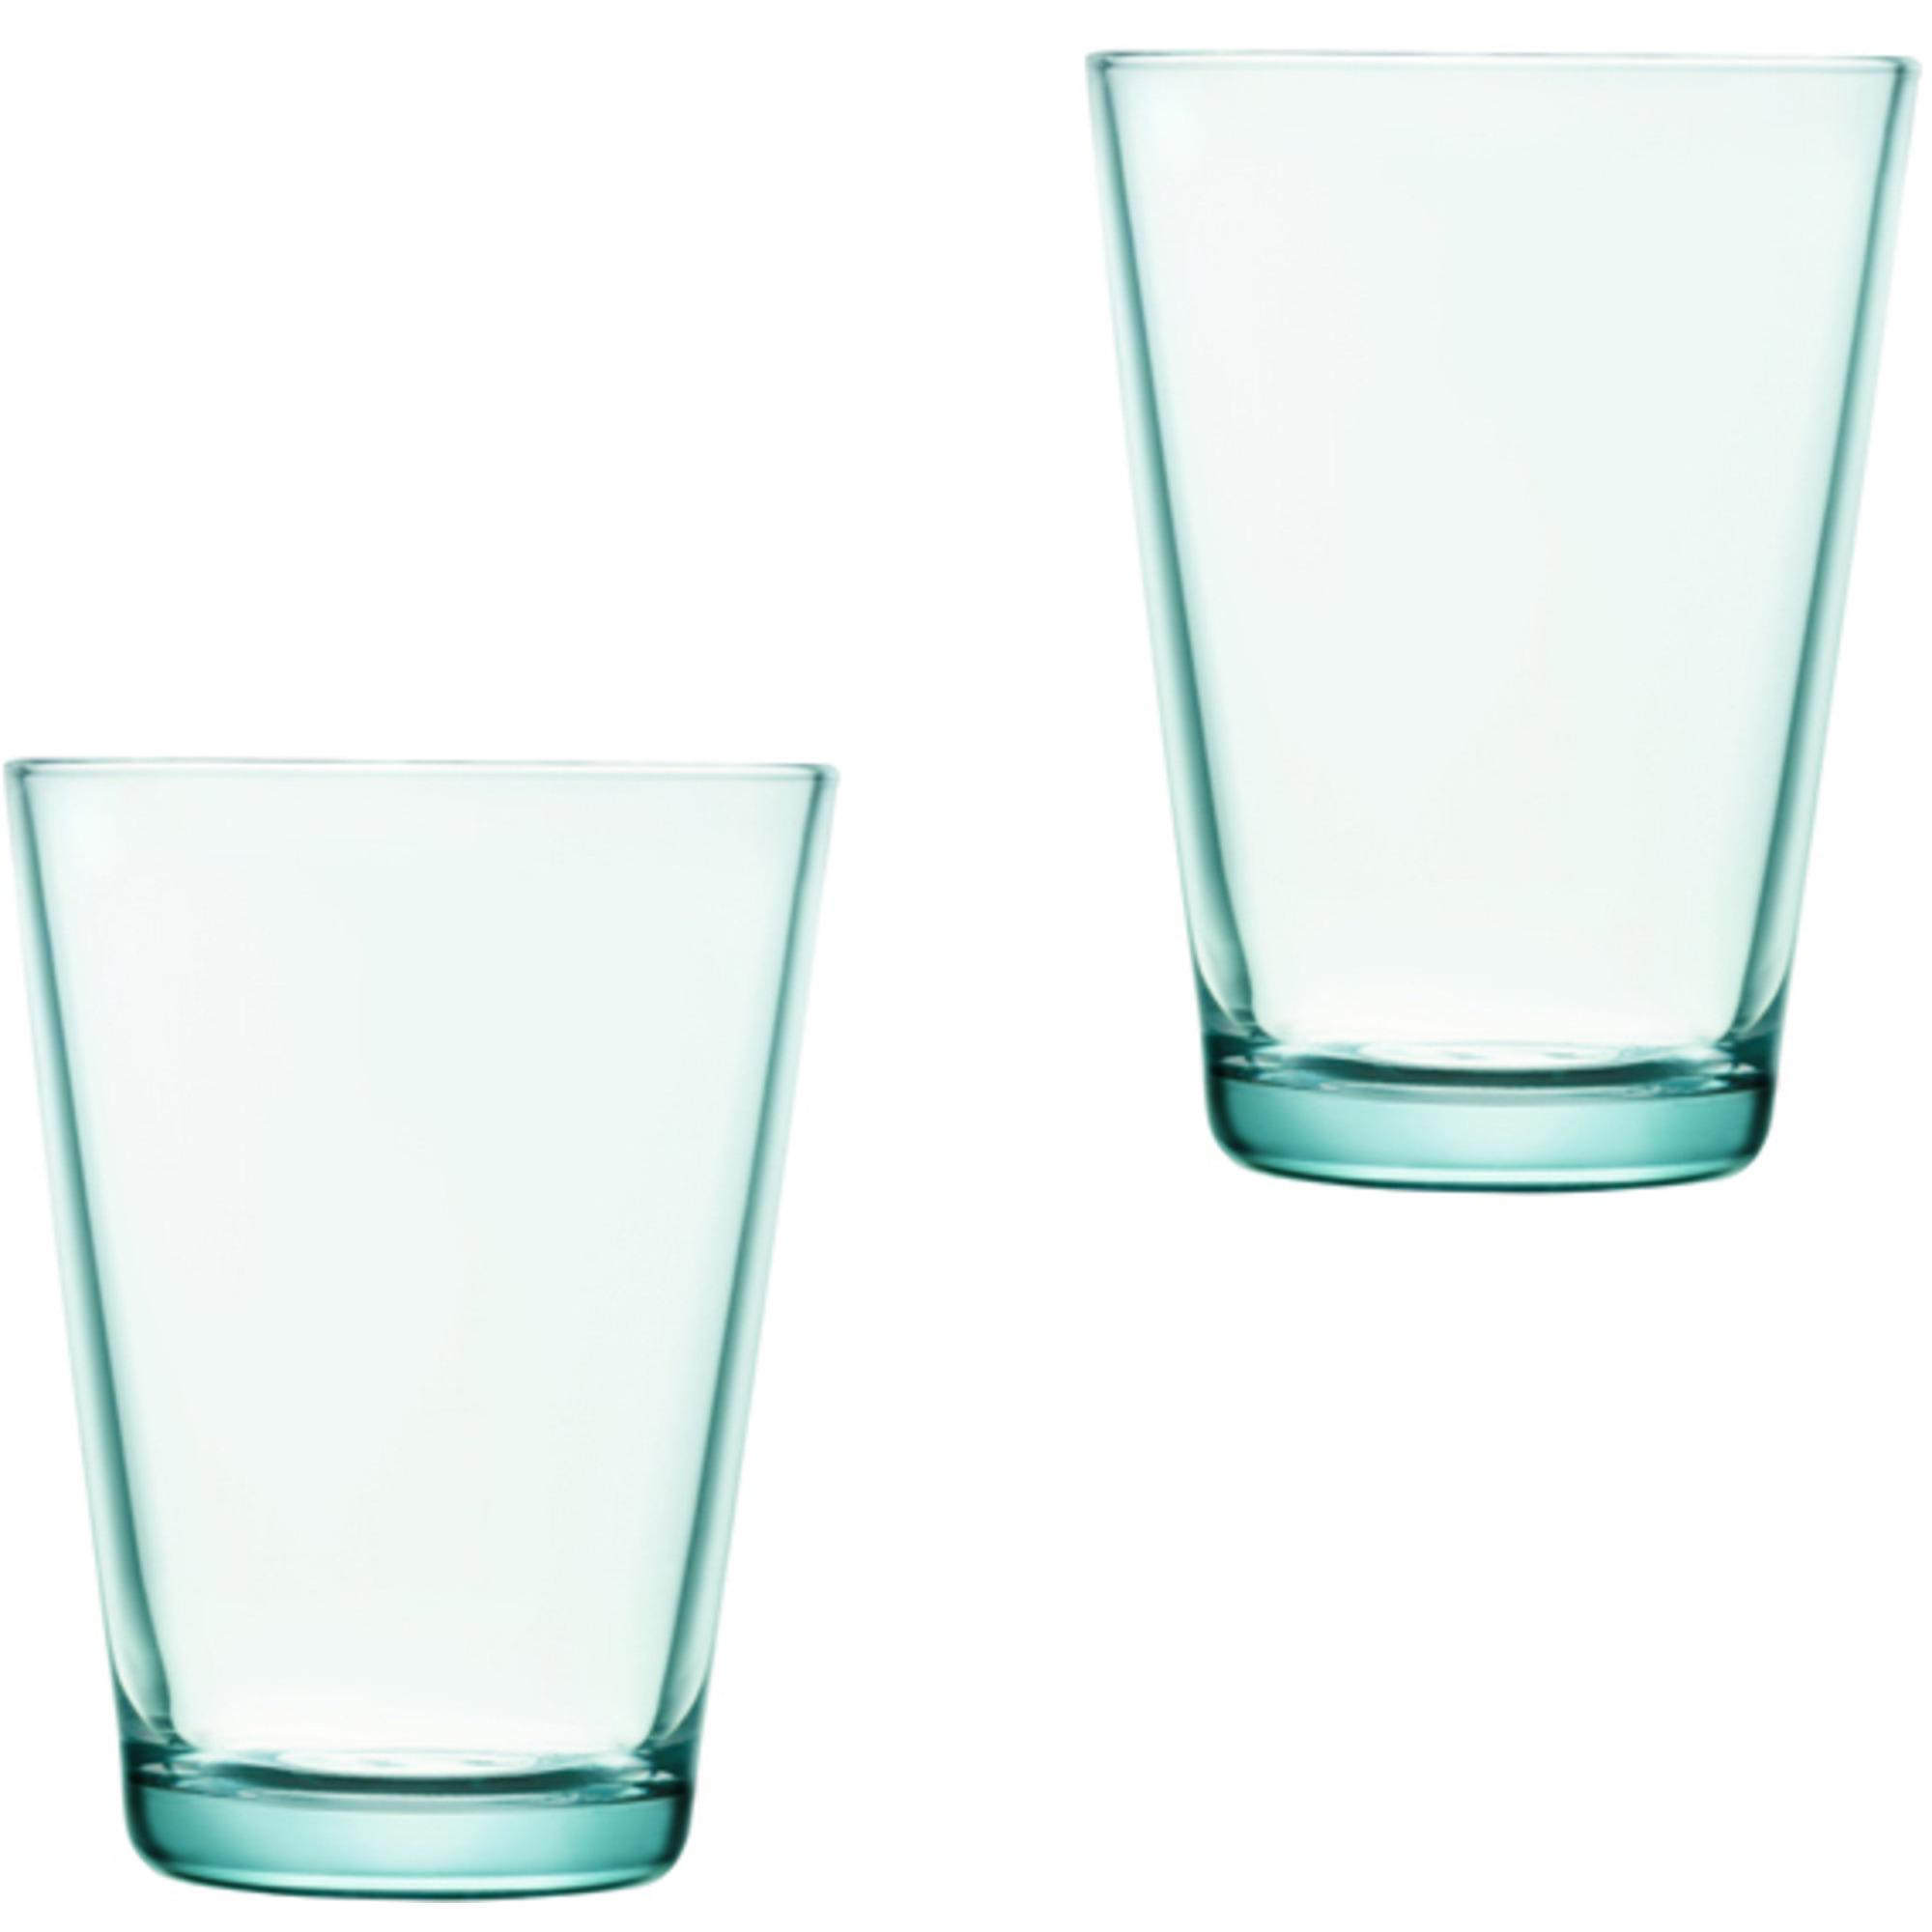 Iittala Kartio Glas 40 cl Vattengrön 2-pack